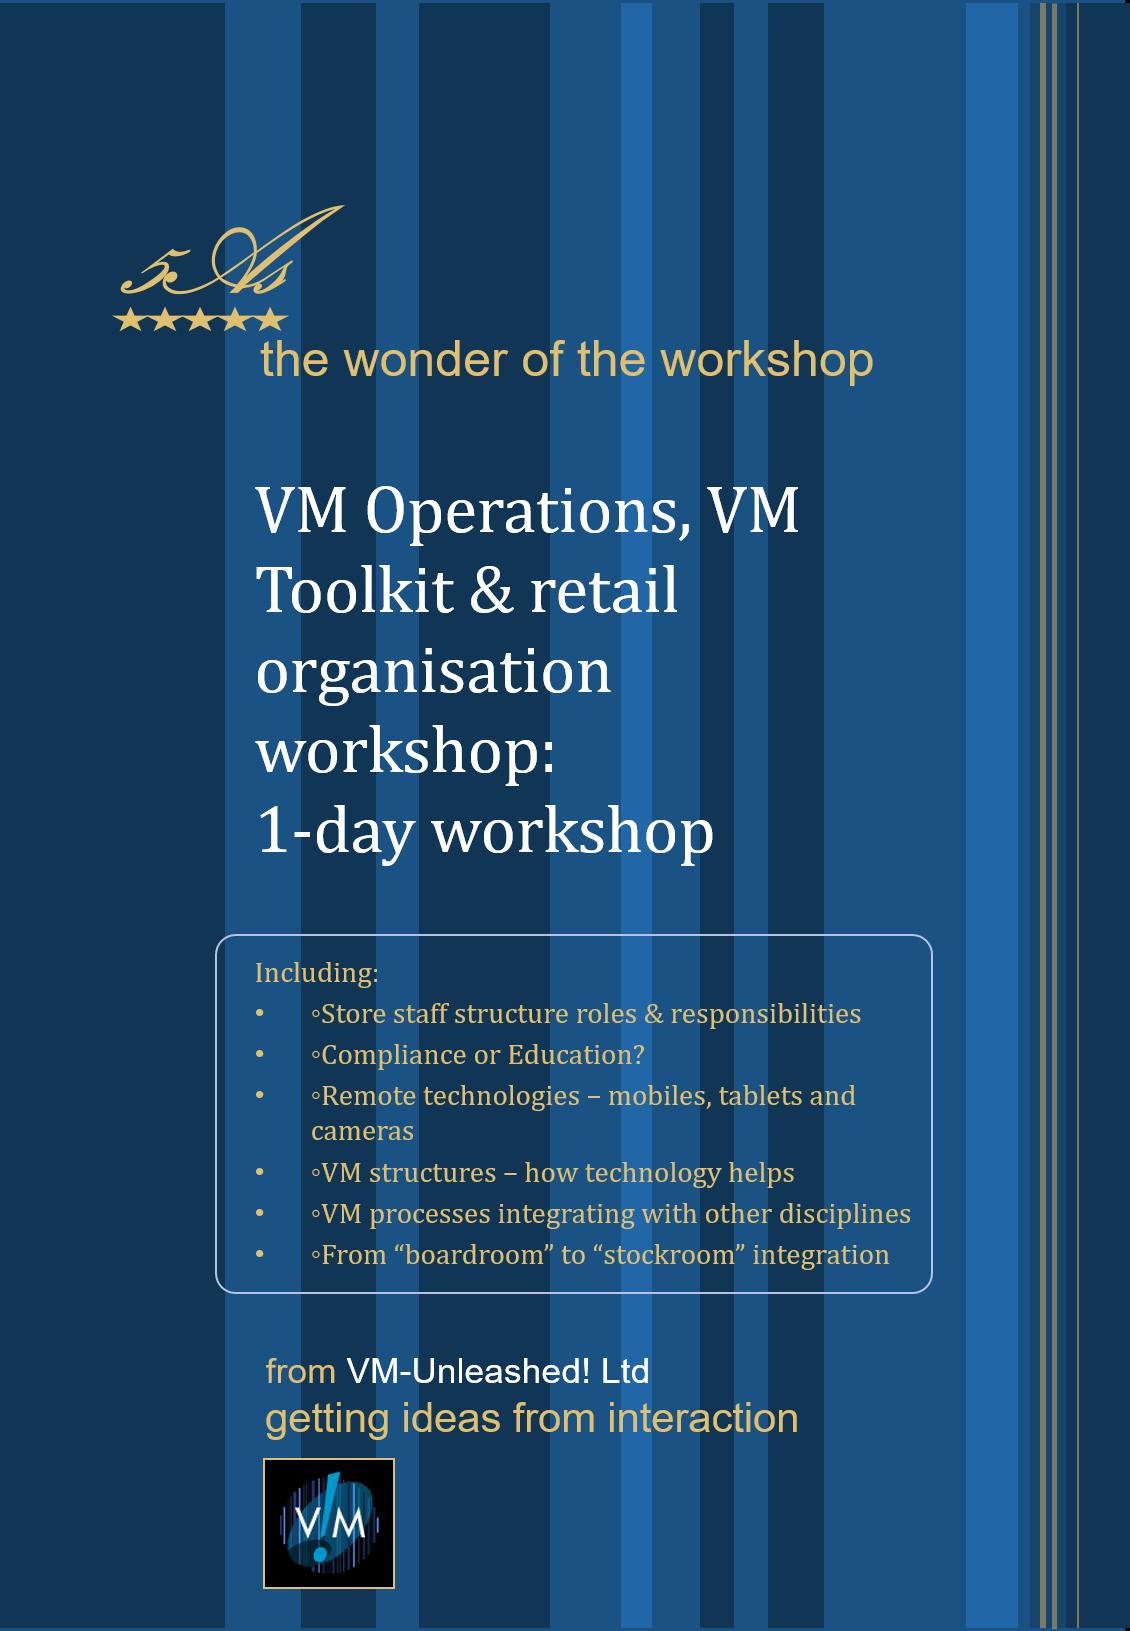 vm-unleashed-workshop-vmtookit-vmoperations-organisational-structure